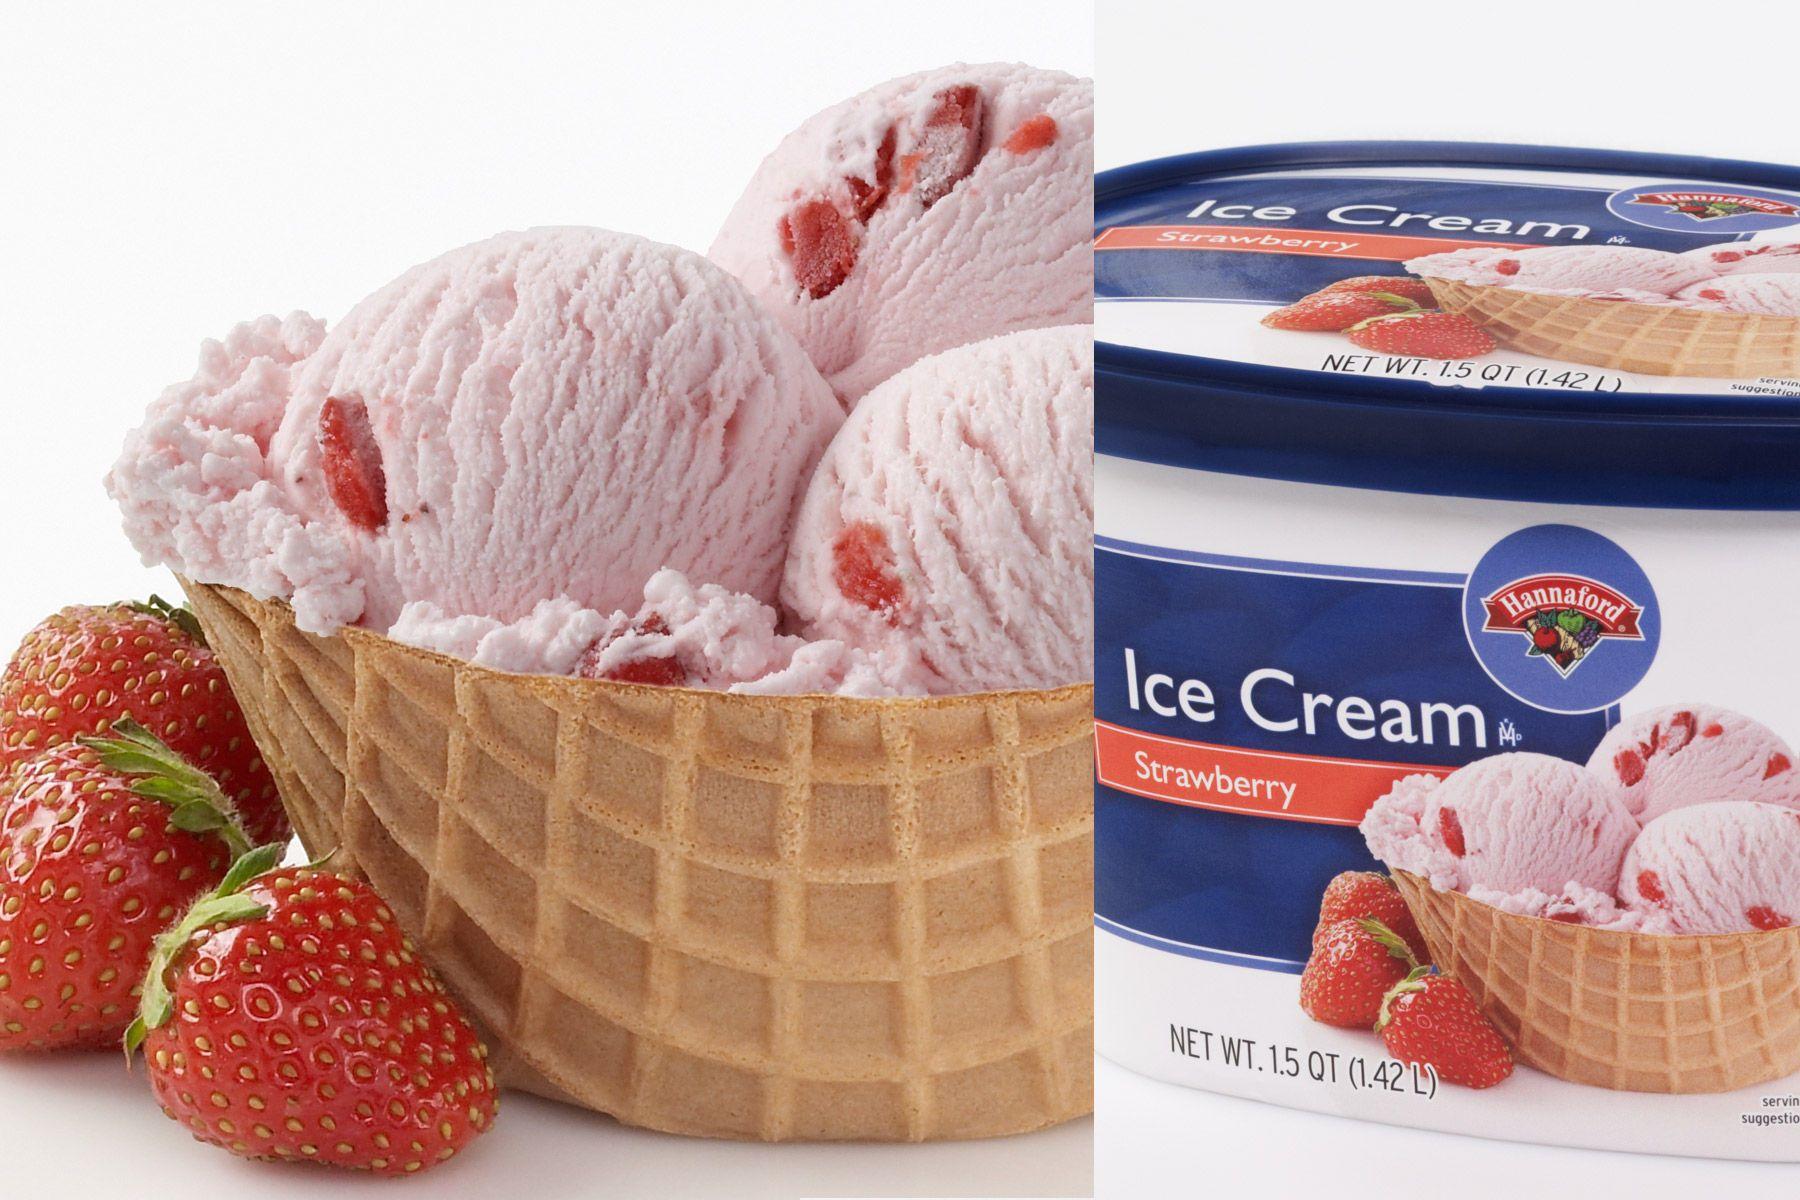 Hannaford Ice Cream Packaging